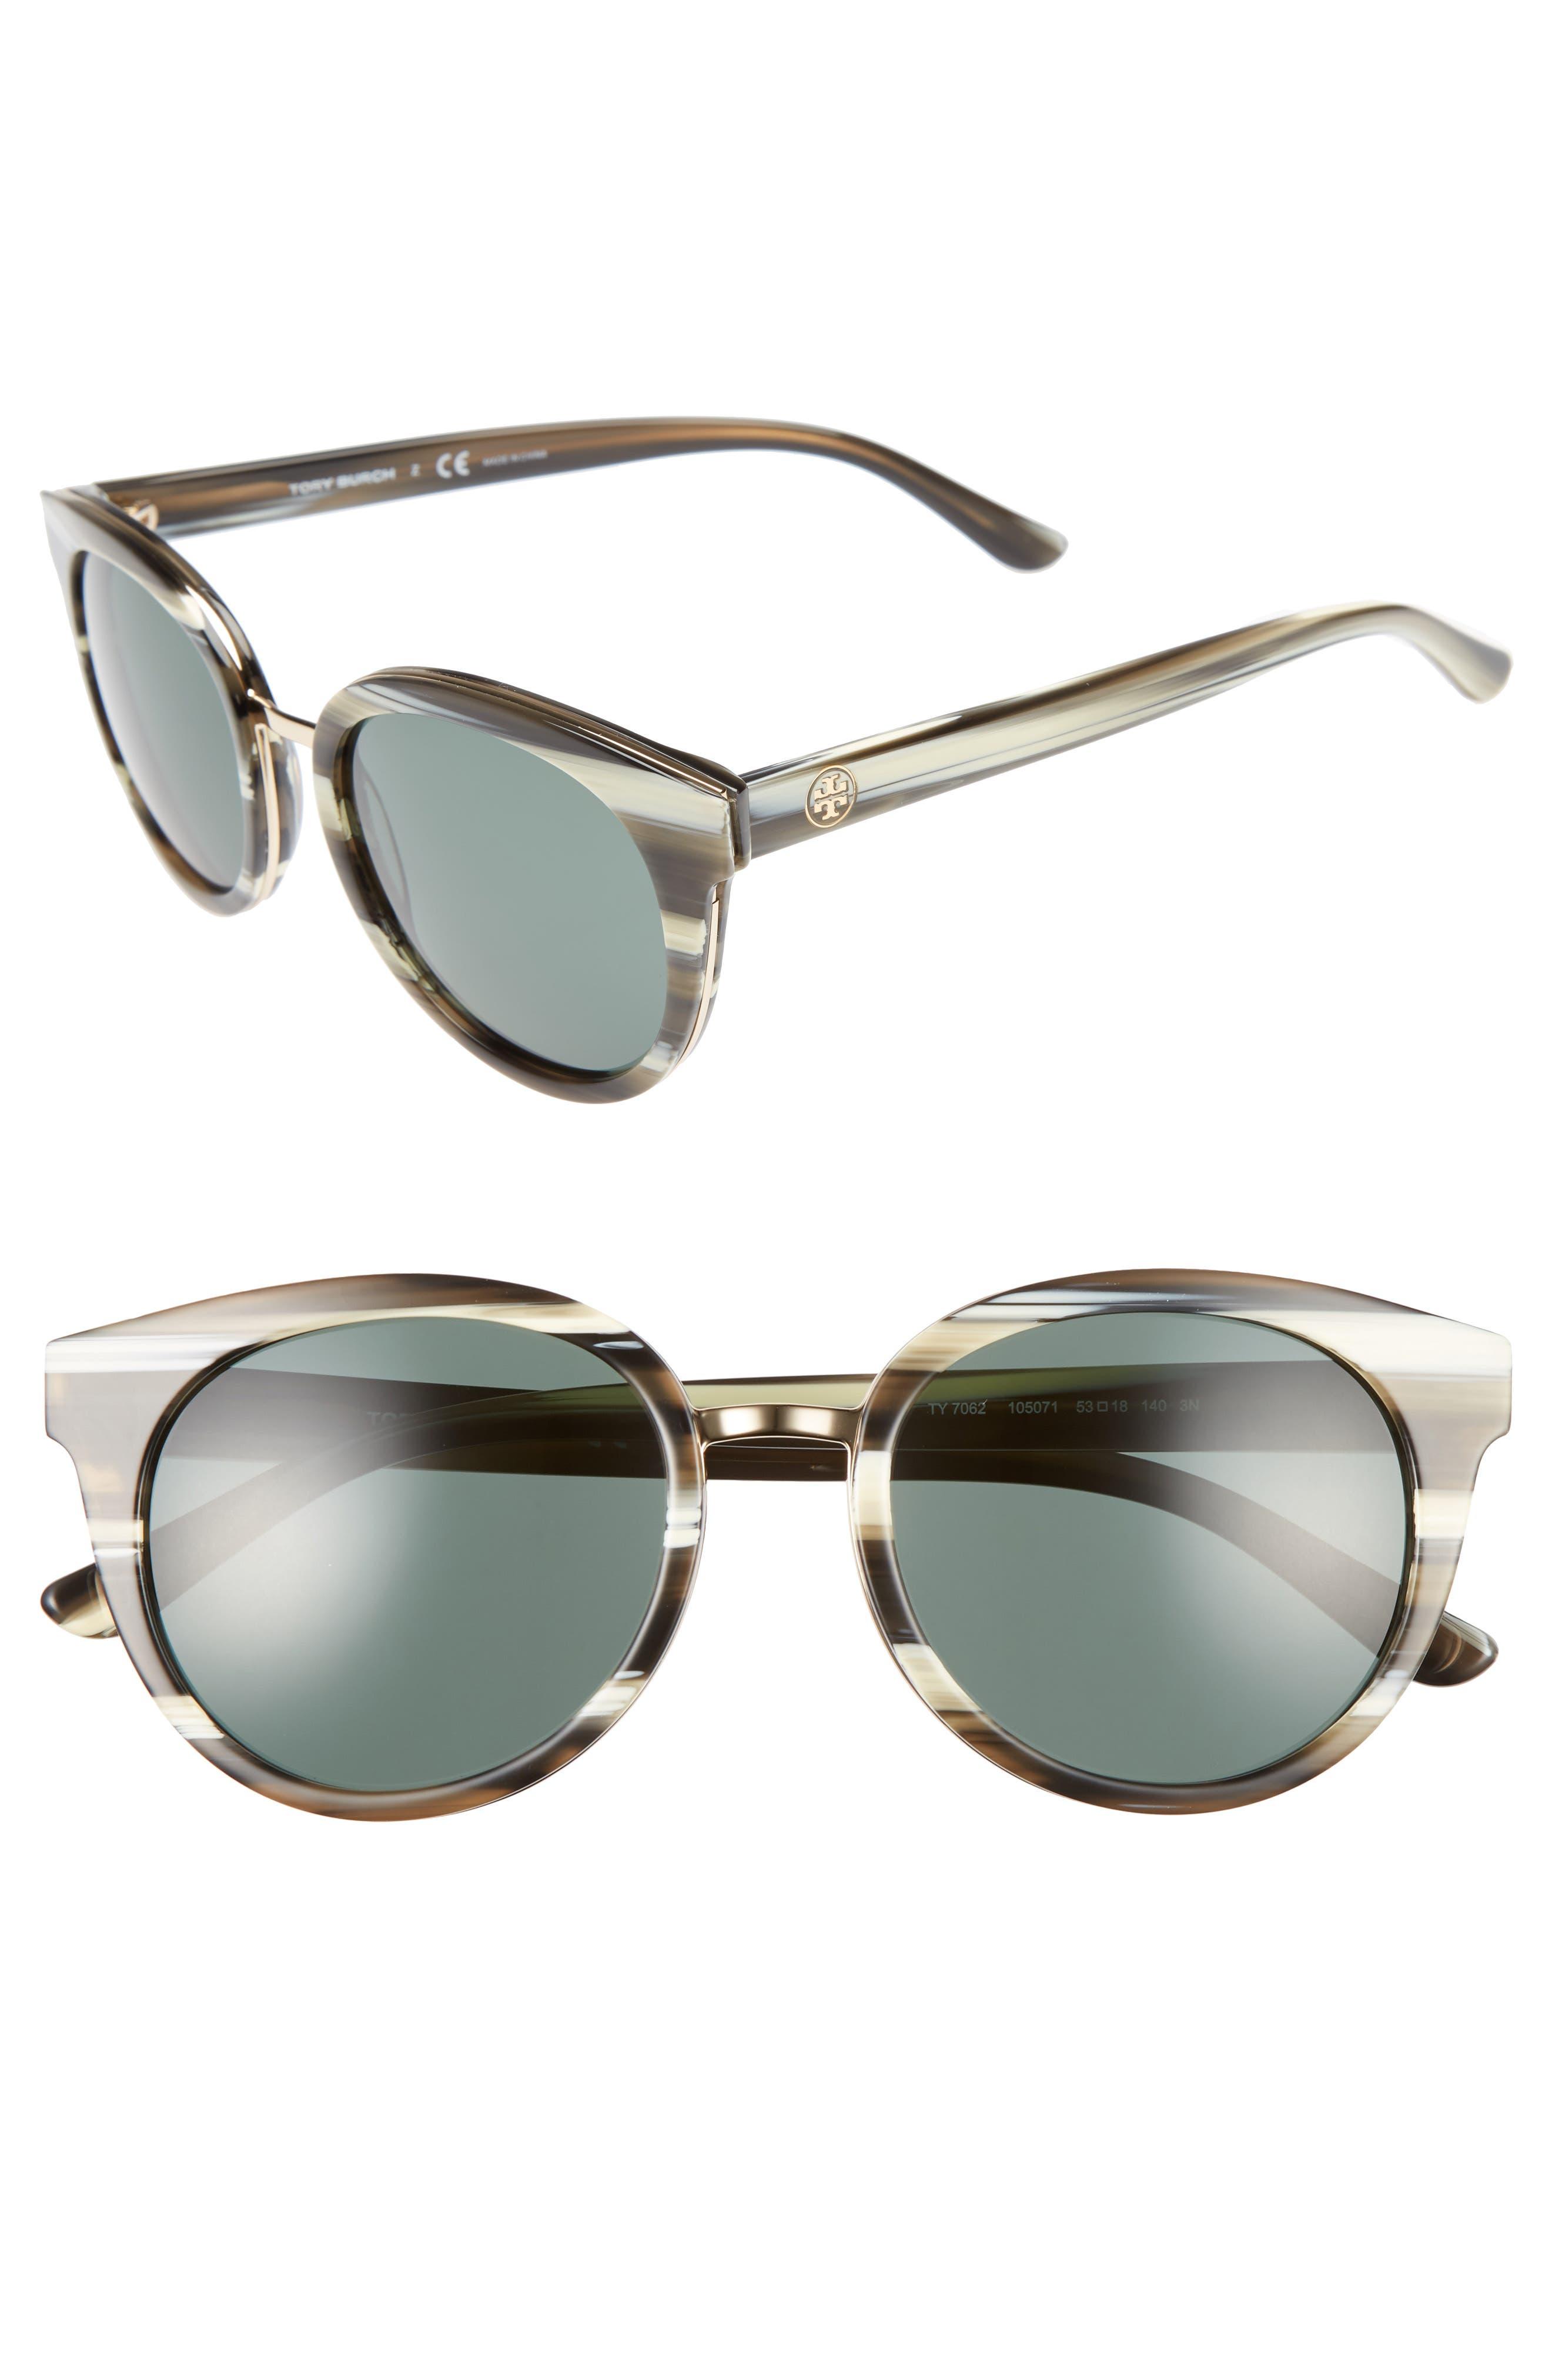 53mm Sunglasses,                         Main,                         color, 300